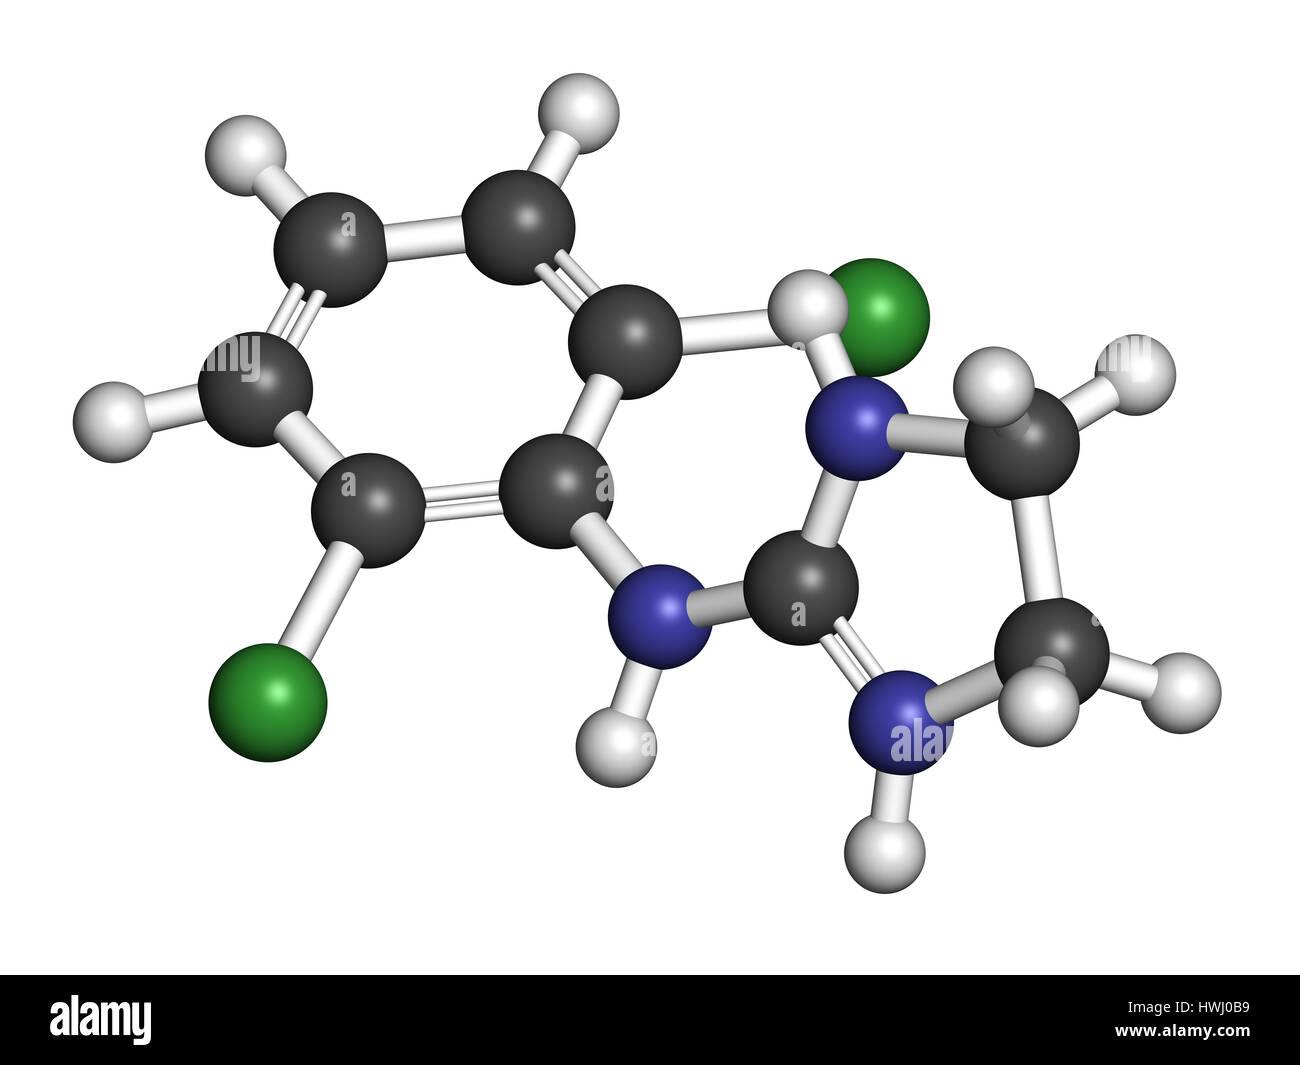 Clonidine drug molecule  Used in treatment of ADHD